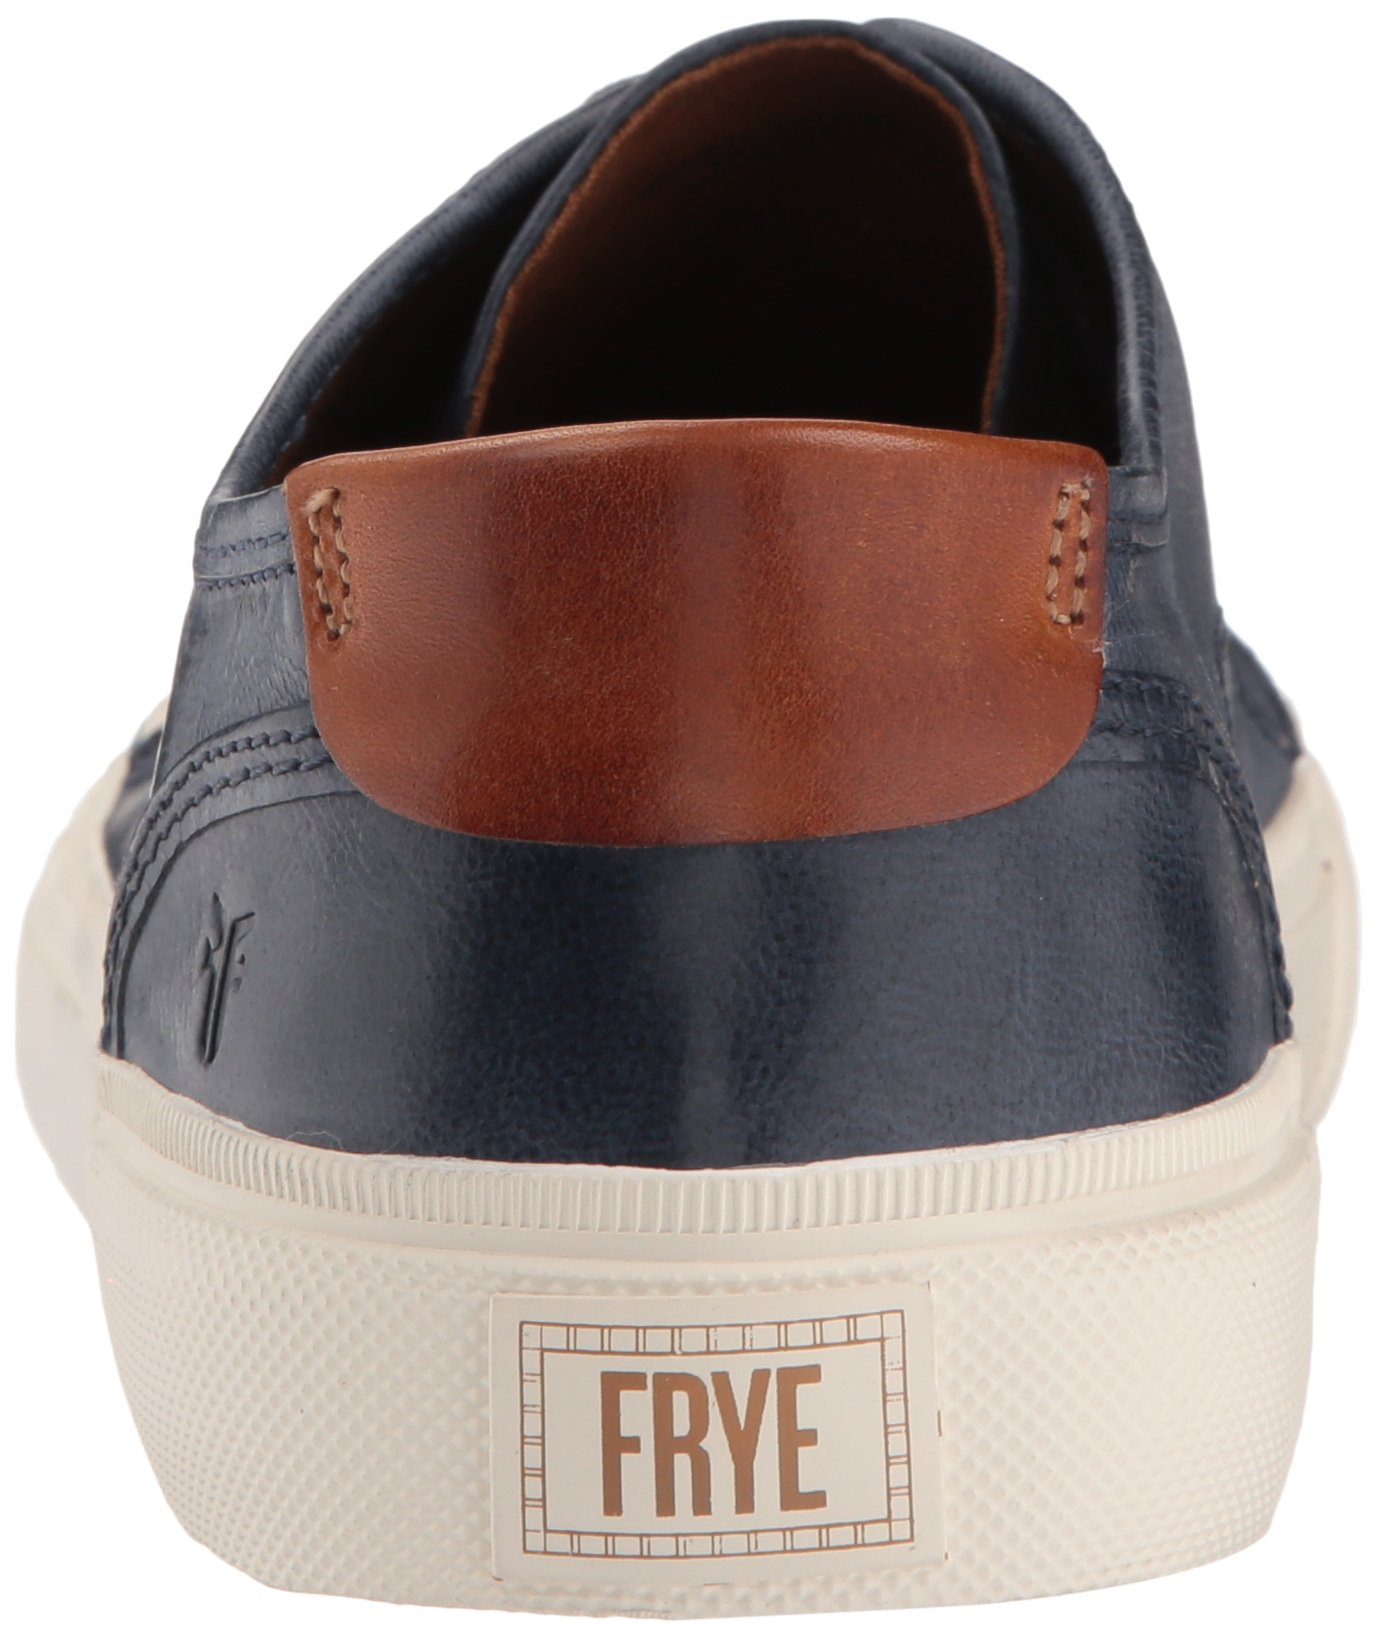 FRYE Men's Ludlow Cap Lowlace Sneaker, Navy, 11 Medium US by FRYE (Image #2)